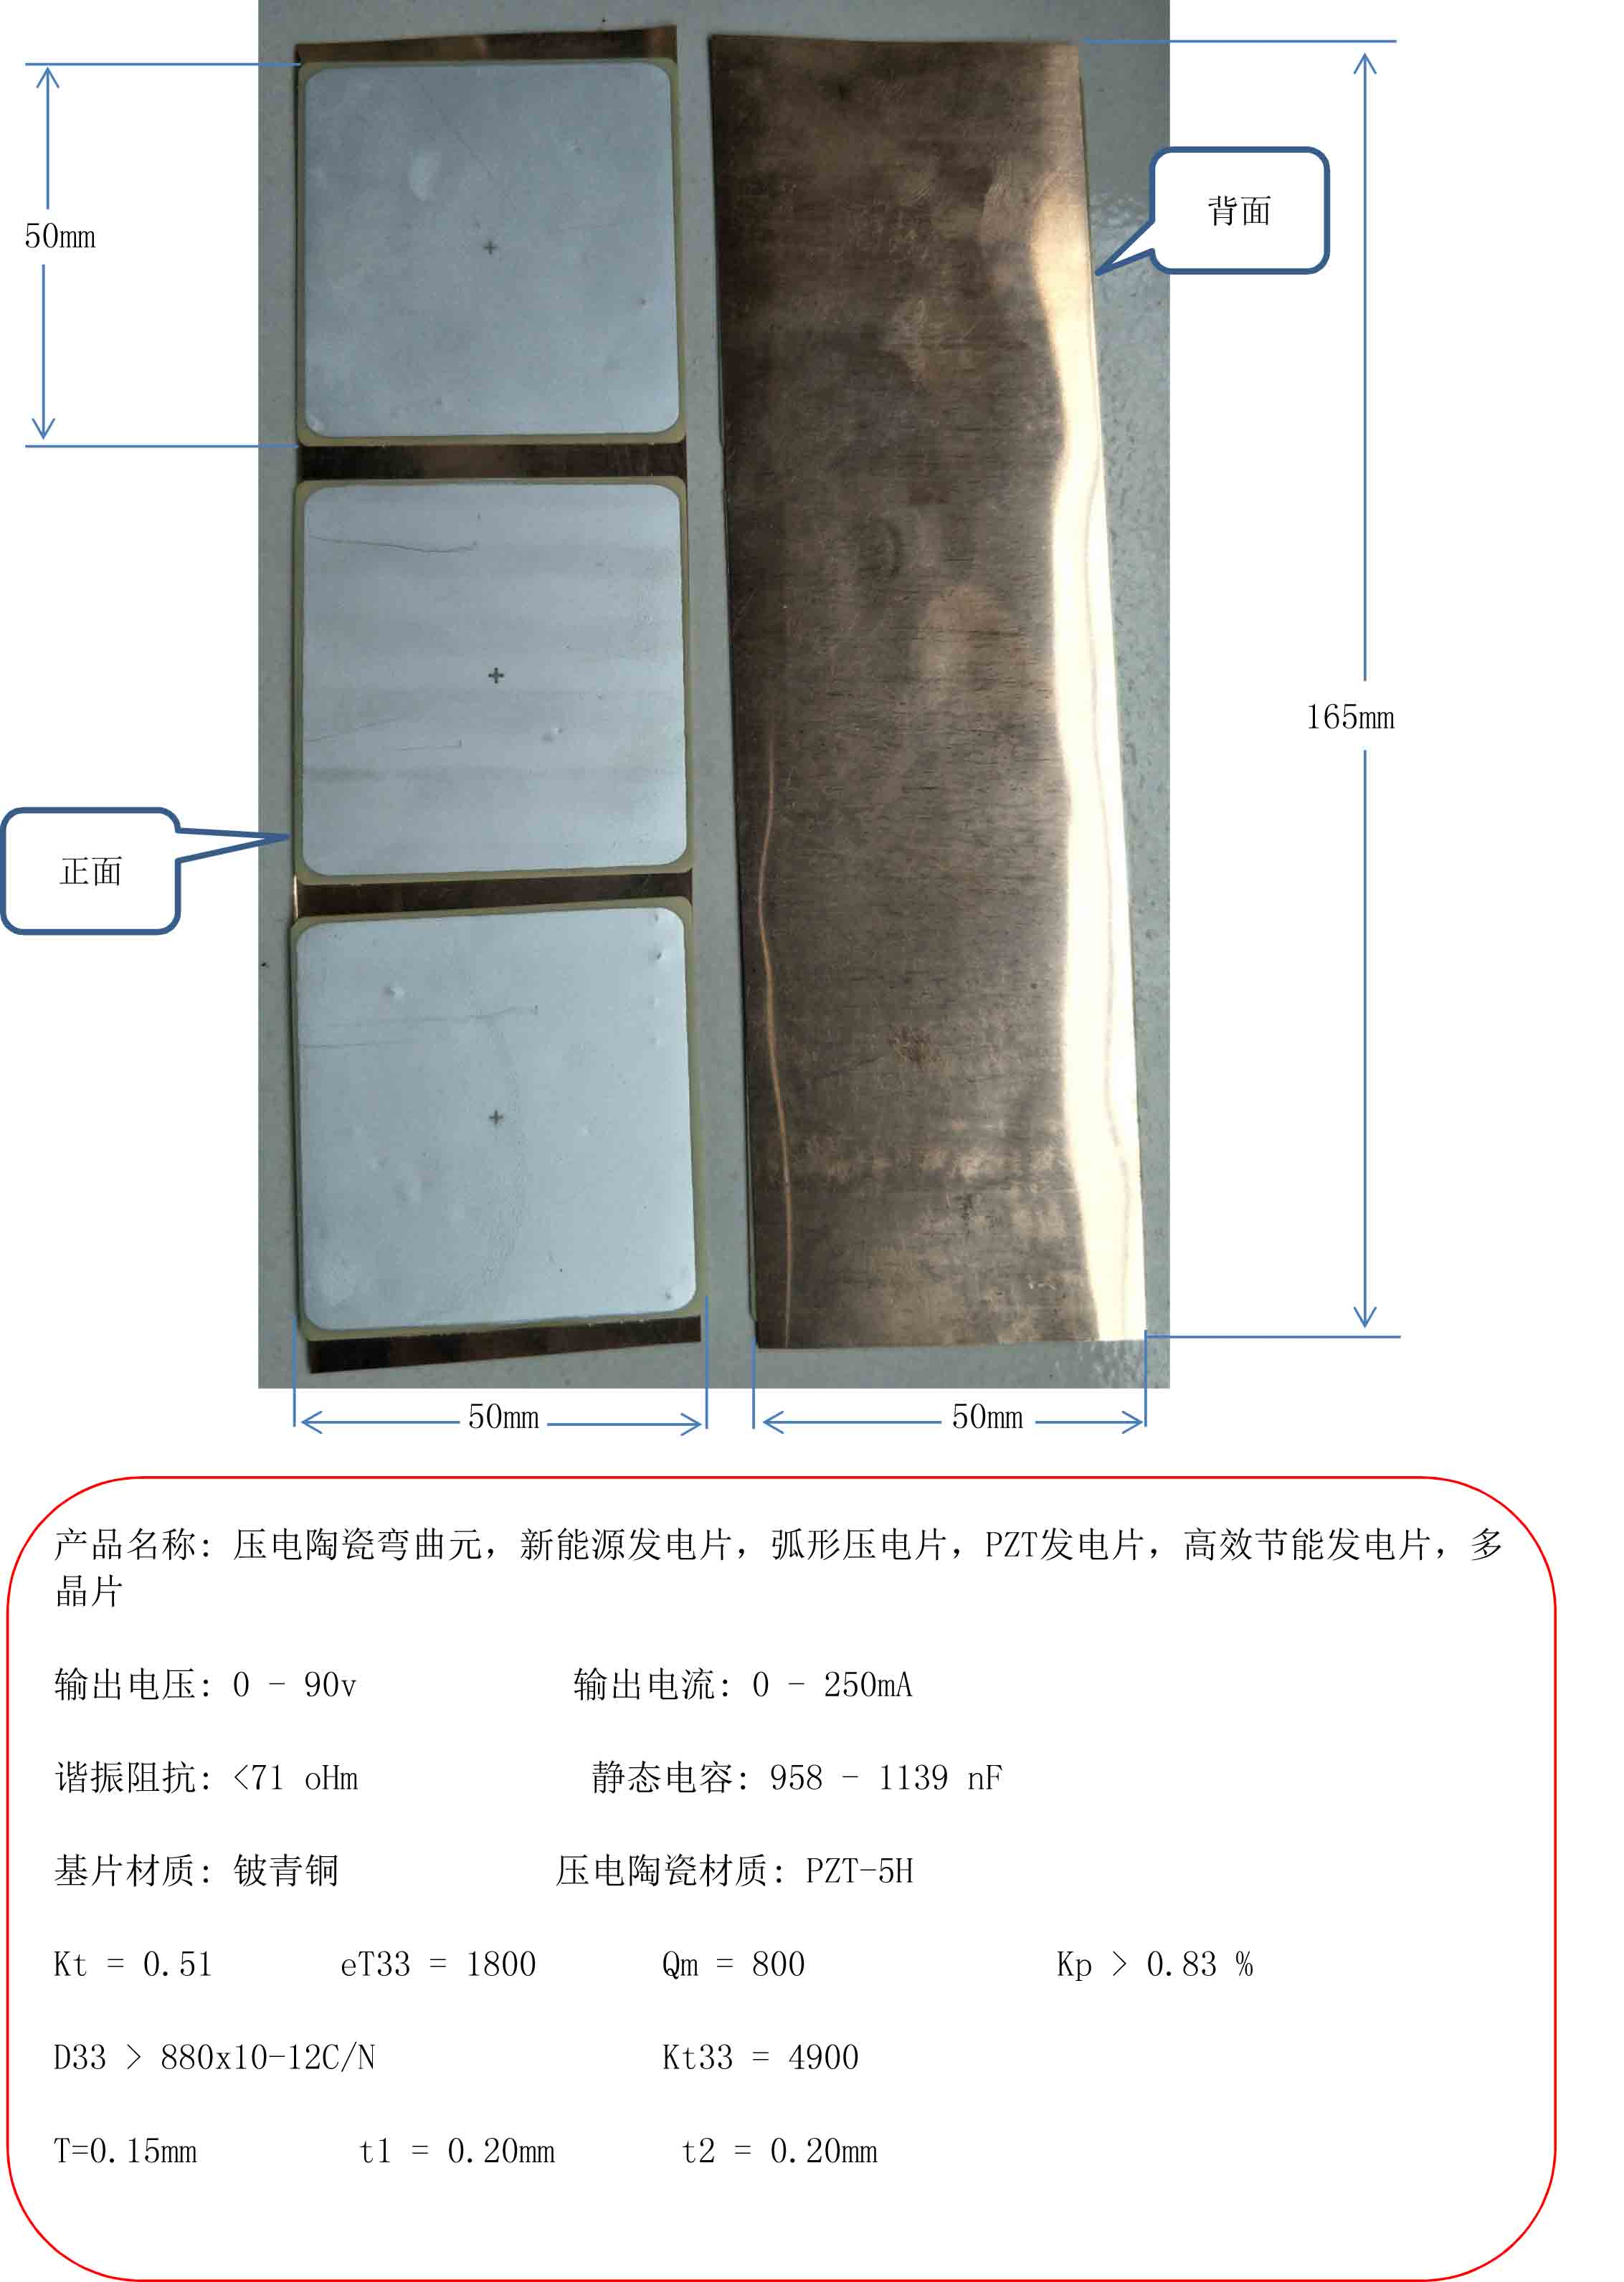 Piezoelectric ceramic bending element, new energy power generation, 165*50mm arc piezoelectric plate, PZT power generation